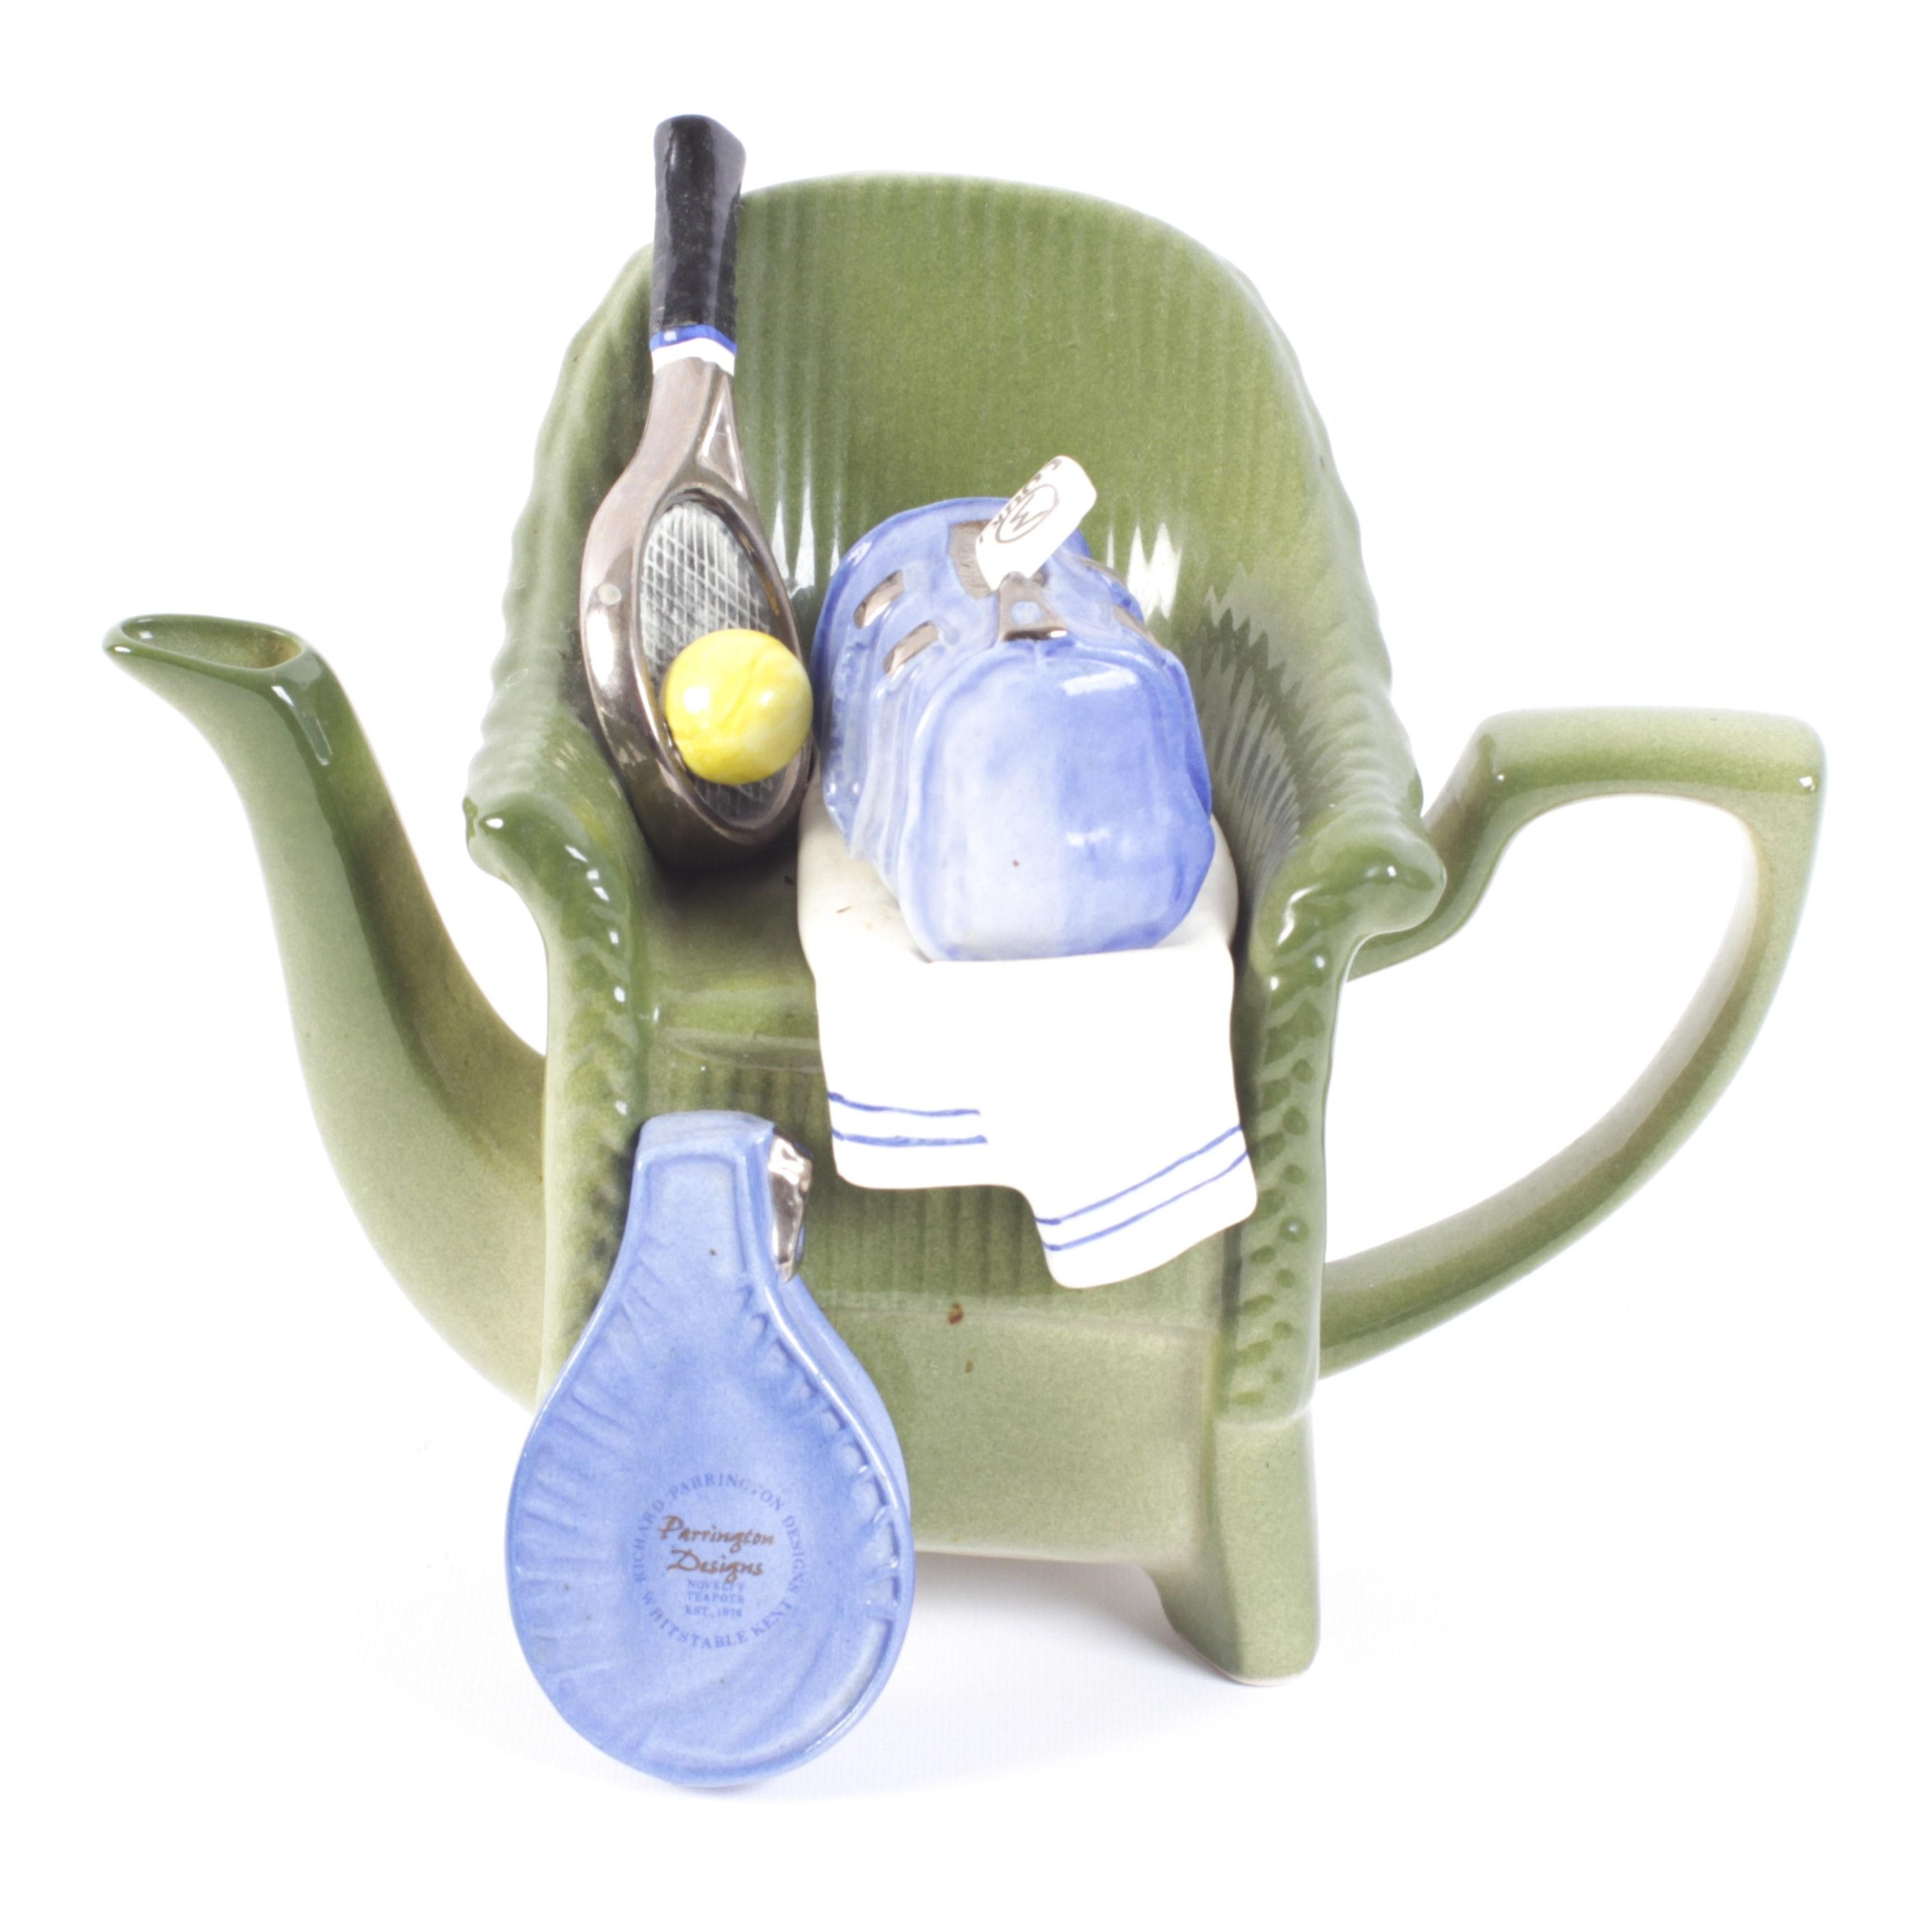 Richard Parrington Tennis Chair Novelty Teapot